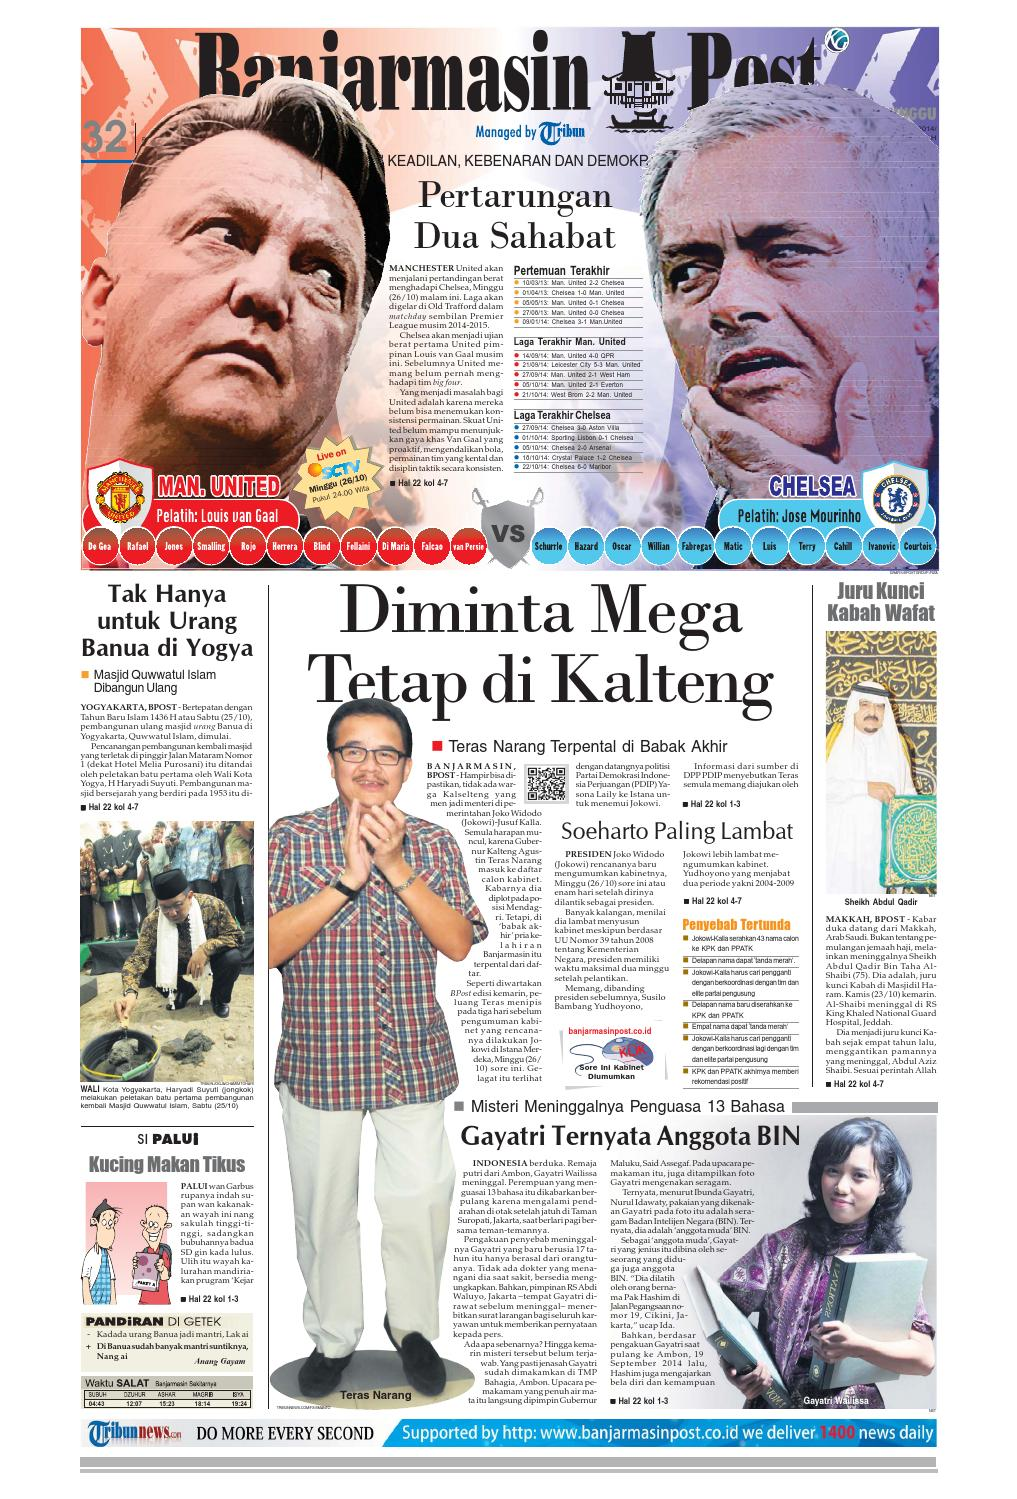 Banjarmasin Post Minggu 26 Oktober 2014 By Issuu Produk Ukm Bumn Tenun Pagatan Atasan Wanita 4